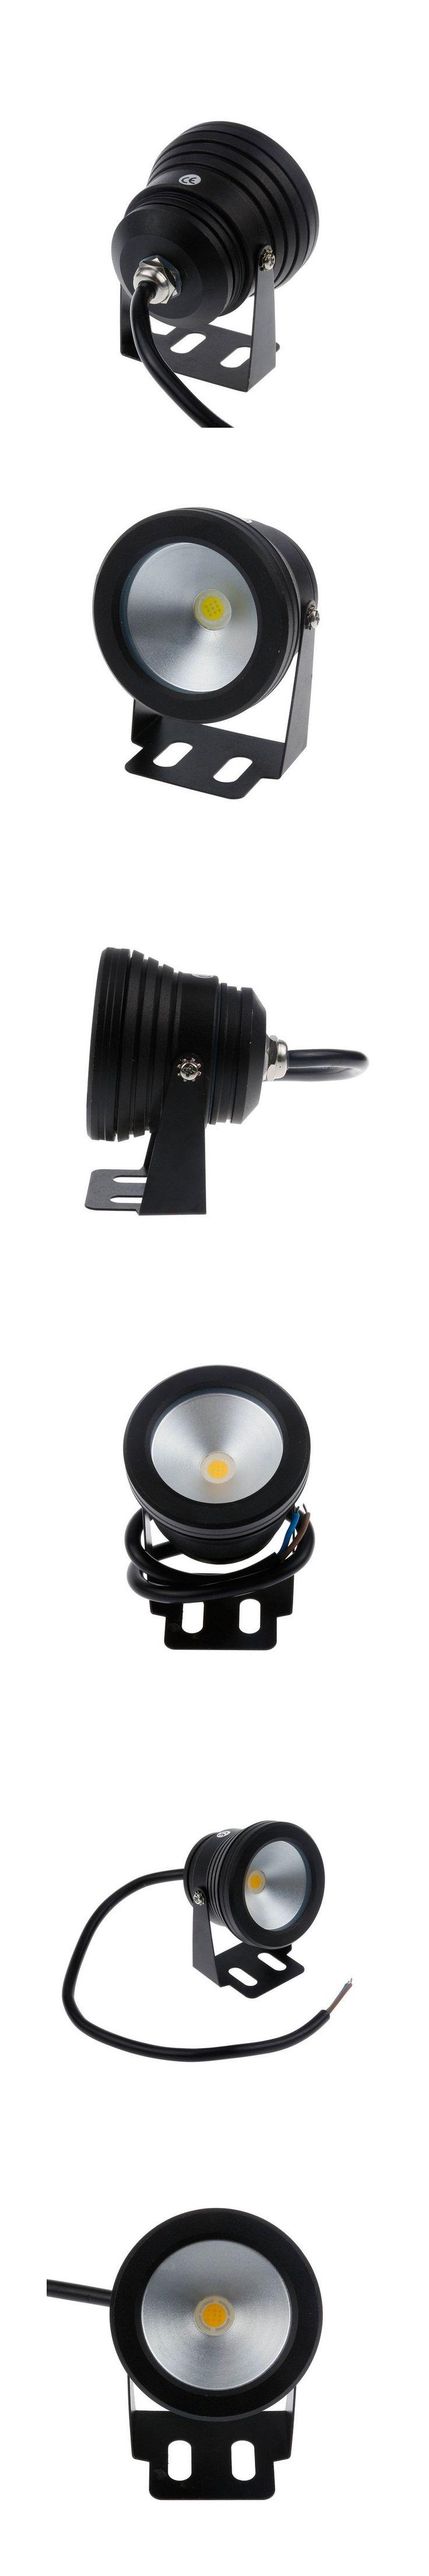 10W 12V LED Underwater Light Warm Light Cold Light Waterproof IP68 Landscape Lamp Outdoor Light Black Cover Body Free shipping